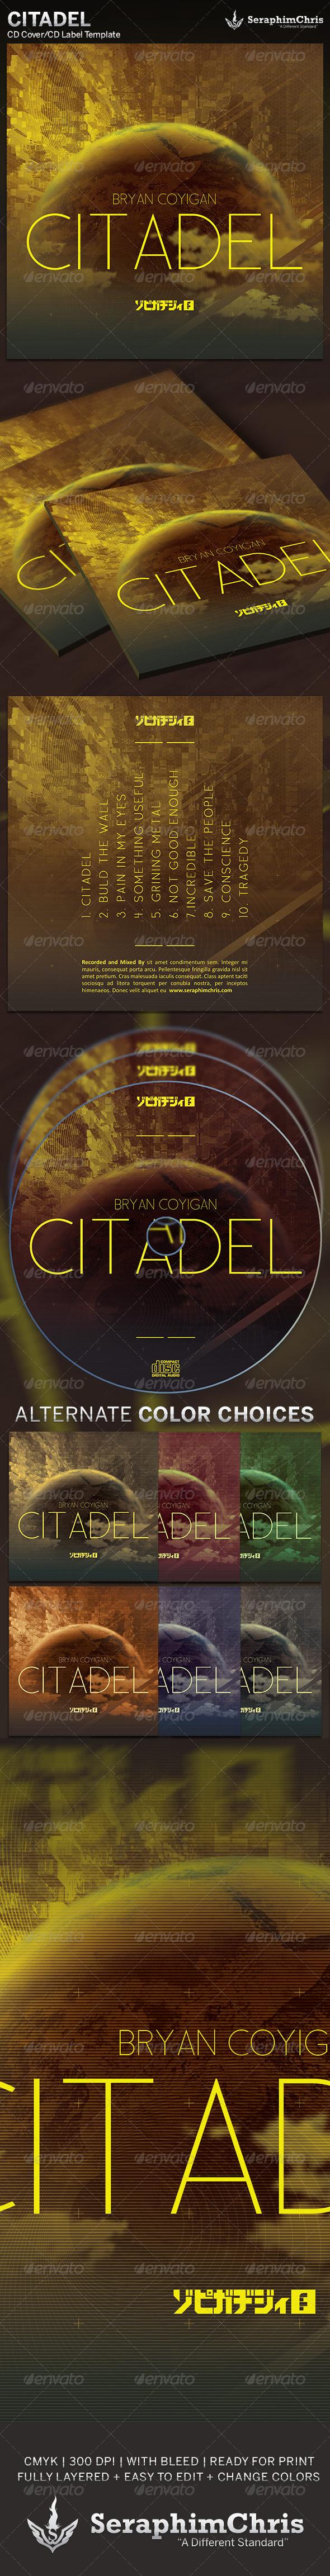 GraphicRiver Citadel CD Cover Artwork Template 5177798